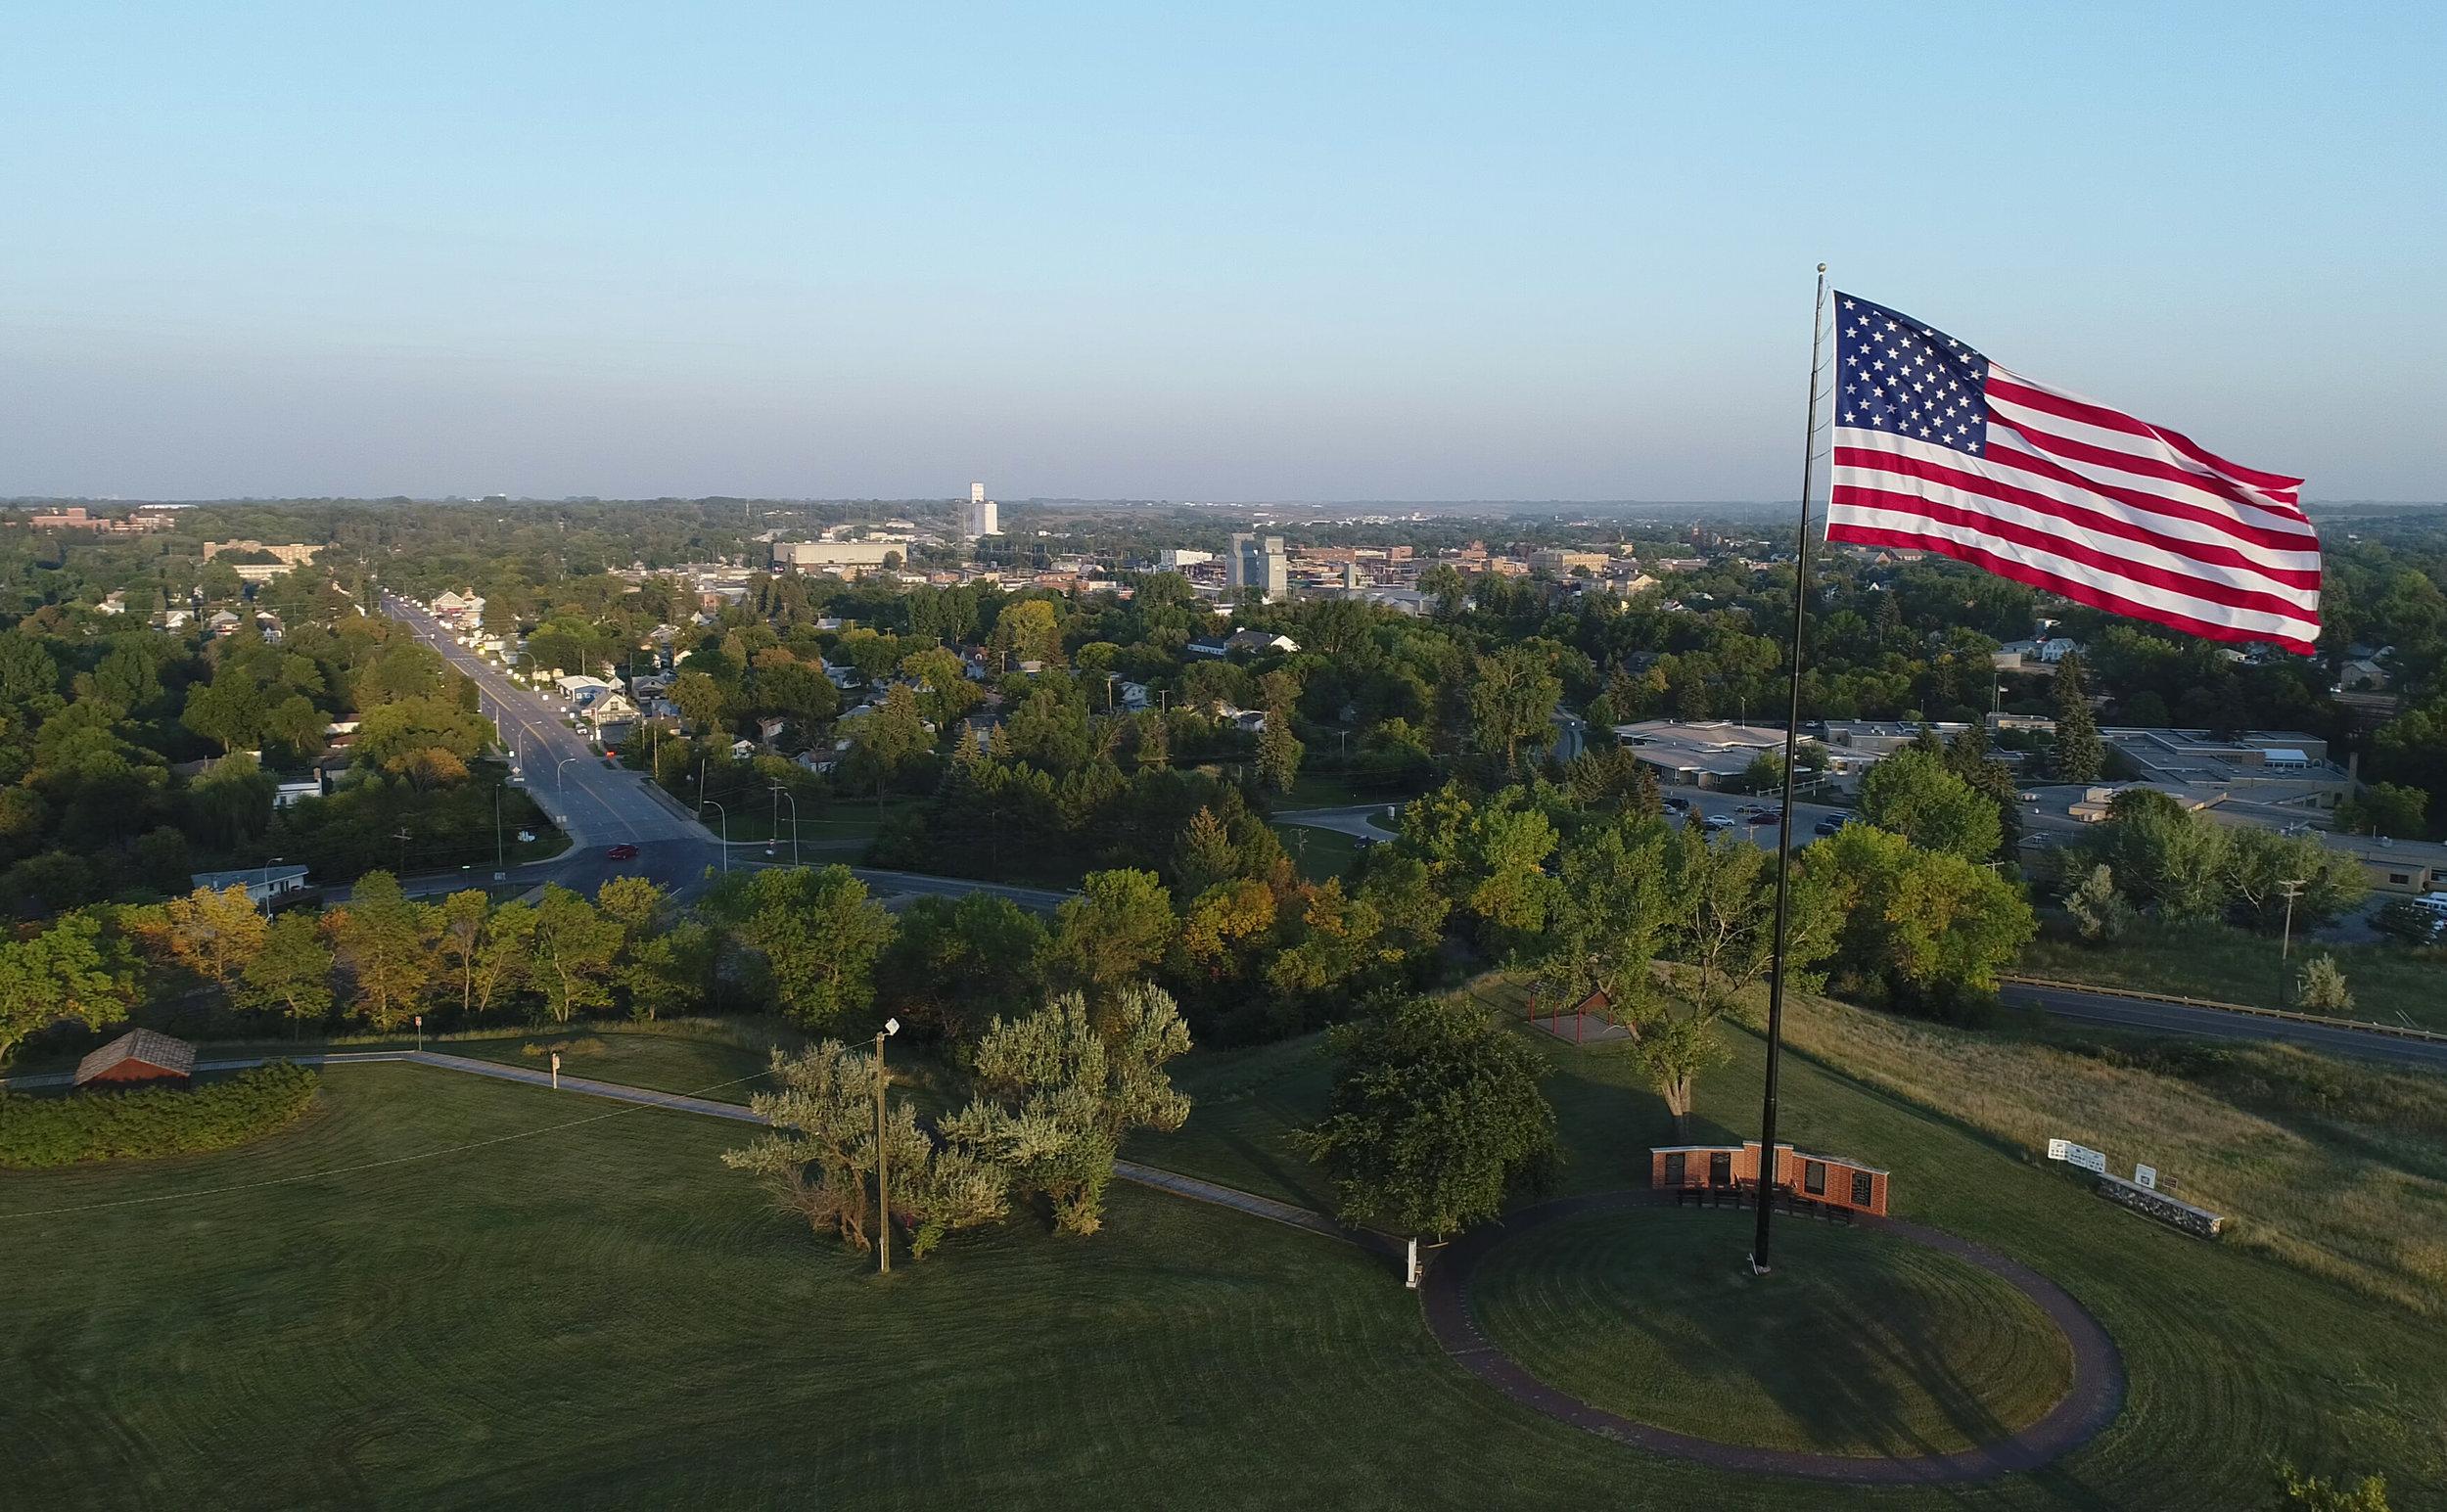 The American Flag flies in the wind over Fort Seward in Jamestown, North Dakota.